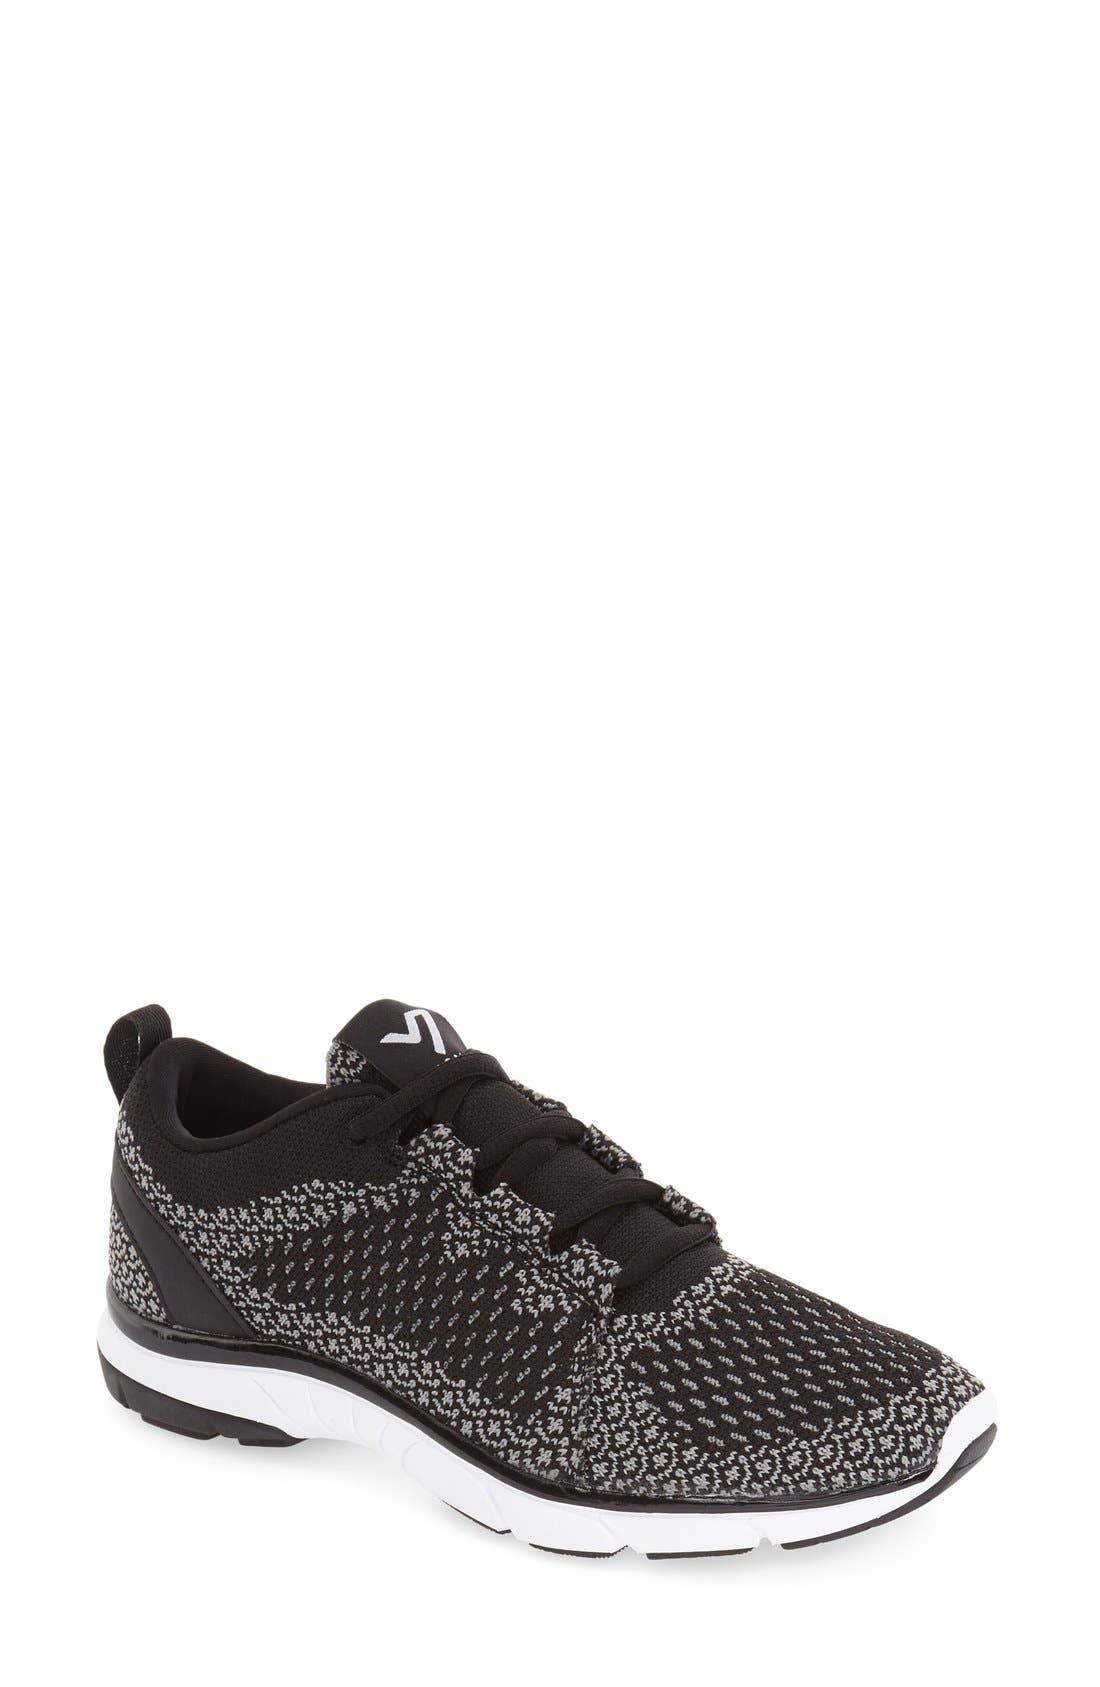 'Sierra' Sneaker,                             Main thumbnail 1, color,                             Black/ Charcoal